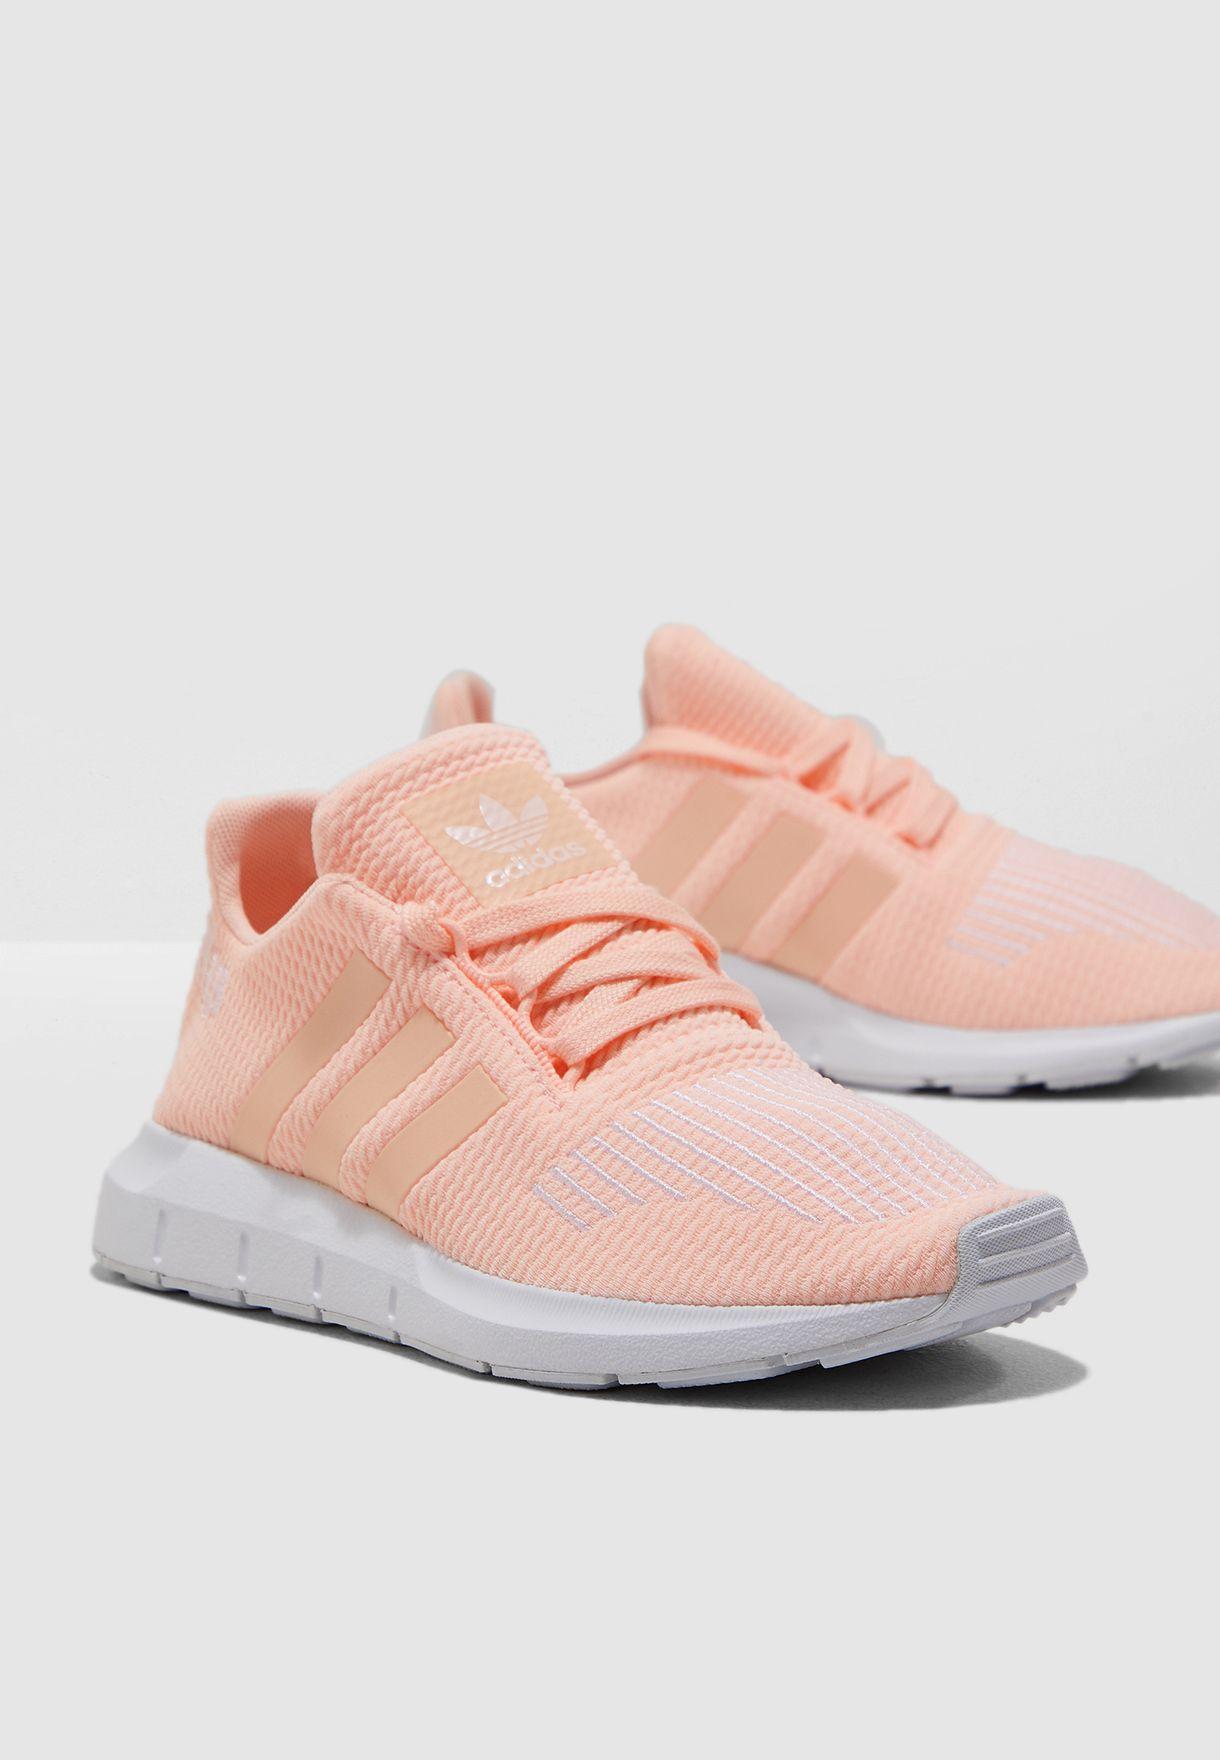 0e0b9d7a32117 Shop adidas Originals pink Youth Swift Run CG6910 for Kids in Saudi ...